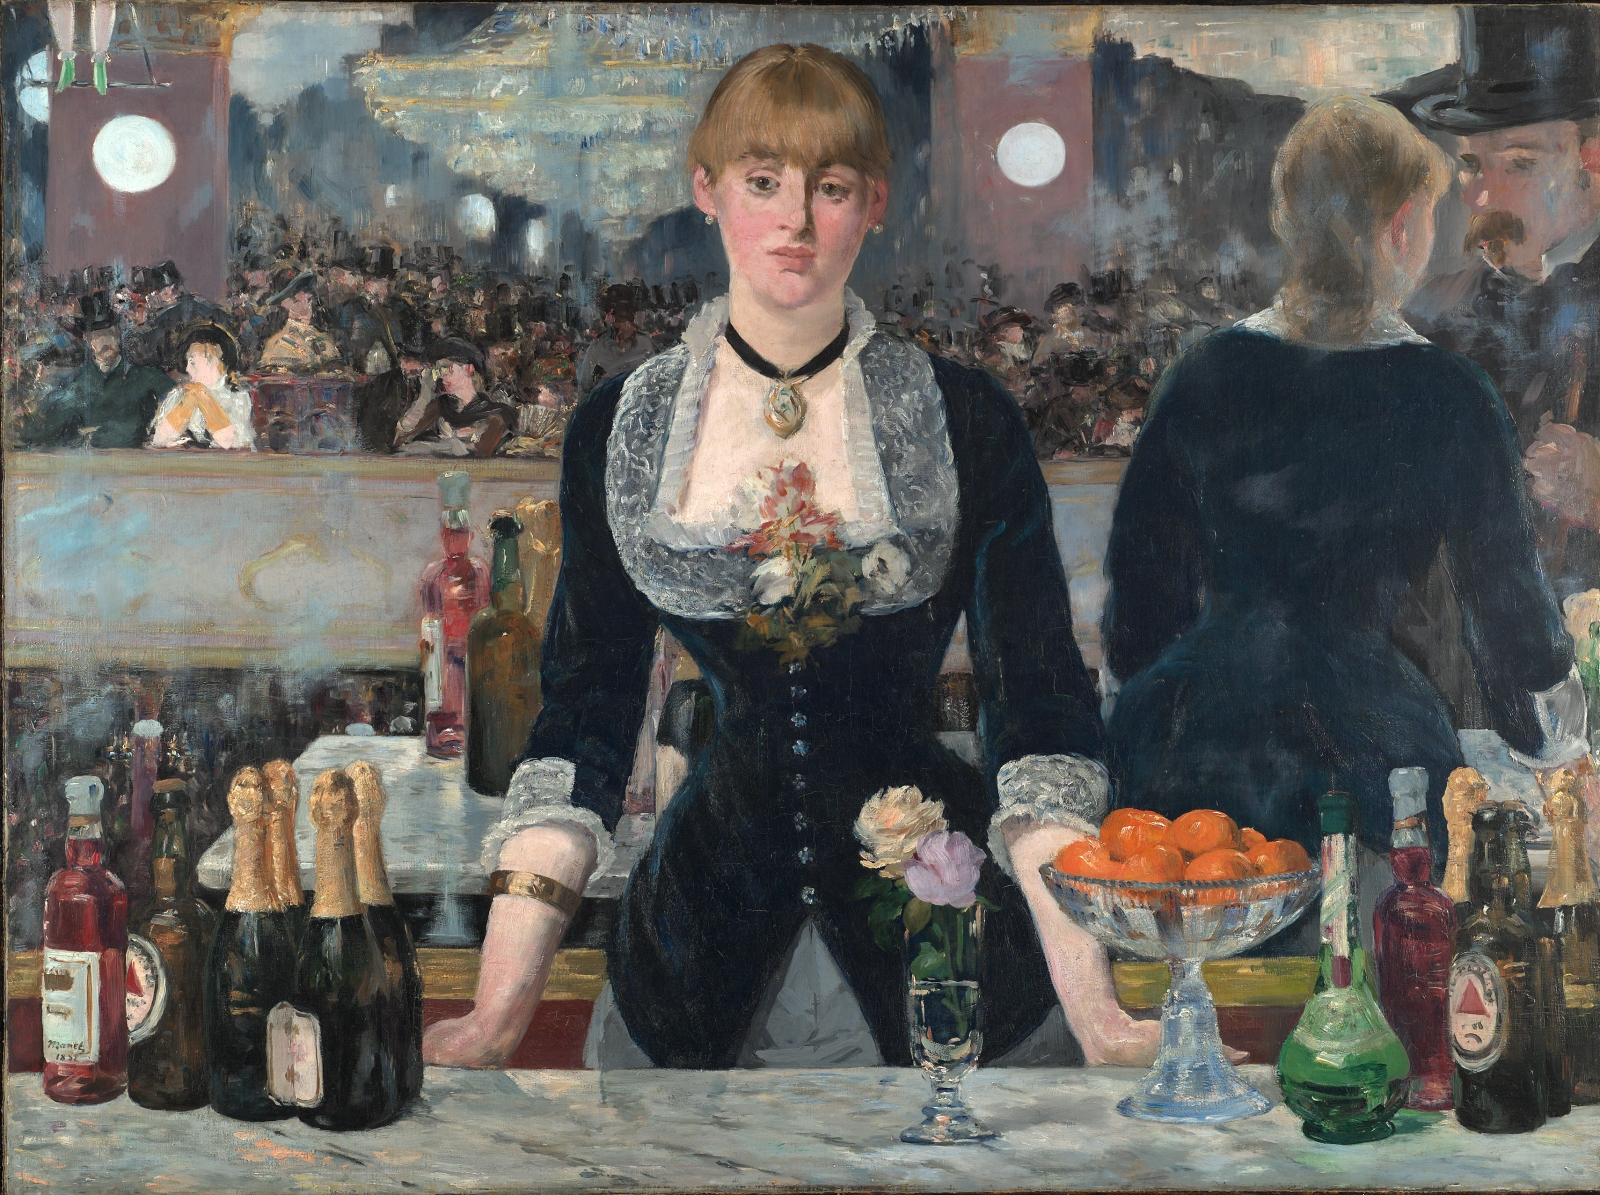 Lot 28 - Moïse Kisling (1891-1953) Buste 25 3/4 x 19 3/4 in (65.4 x 50.1 cm) (Painted in 1935)